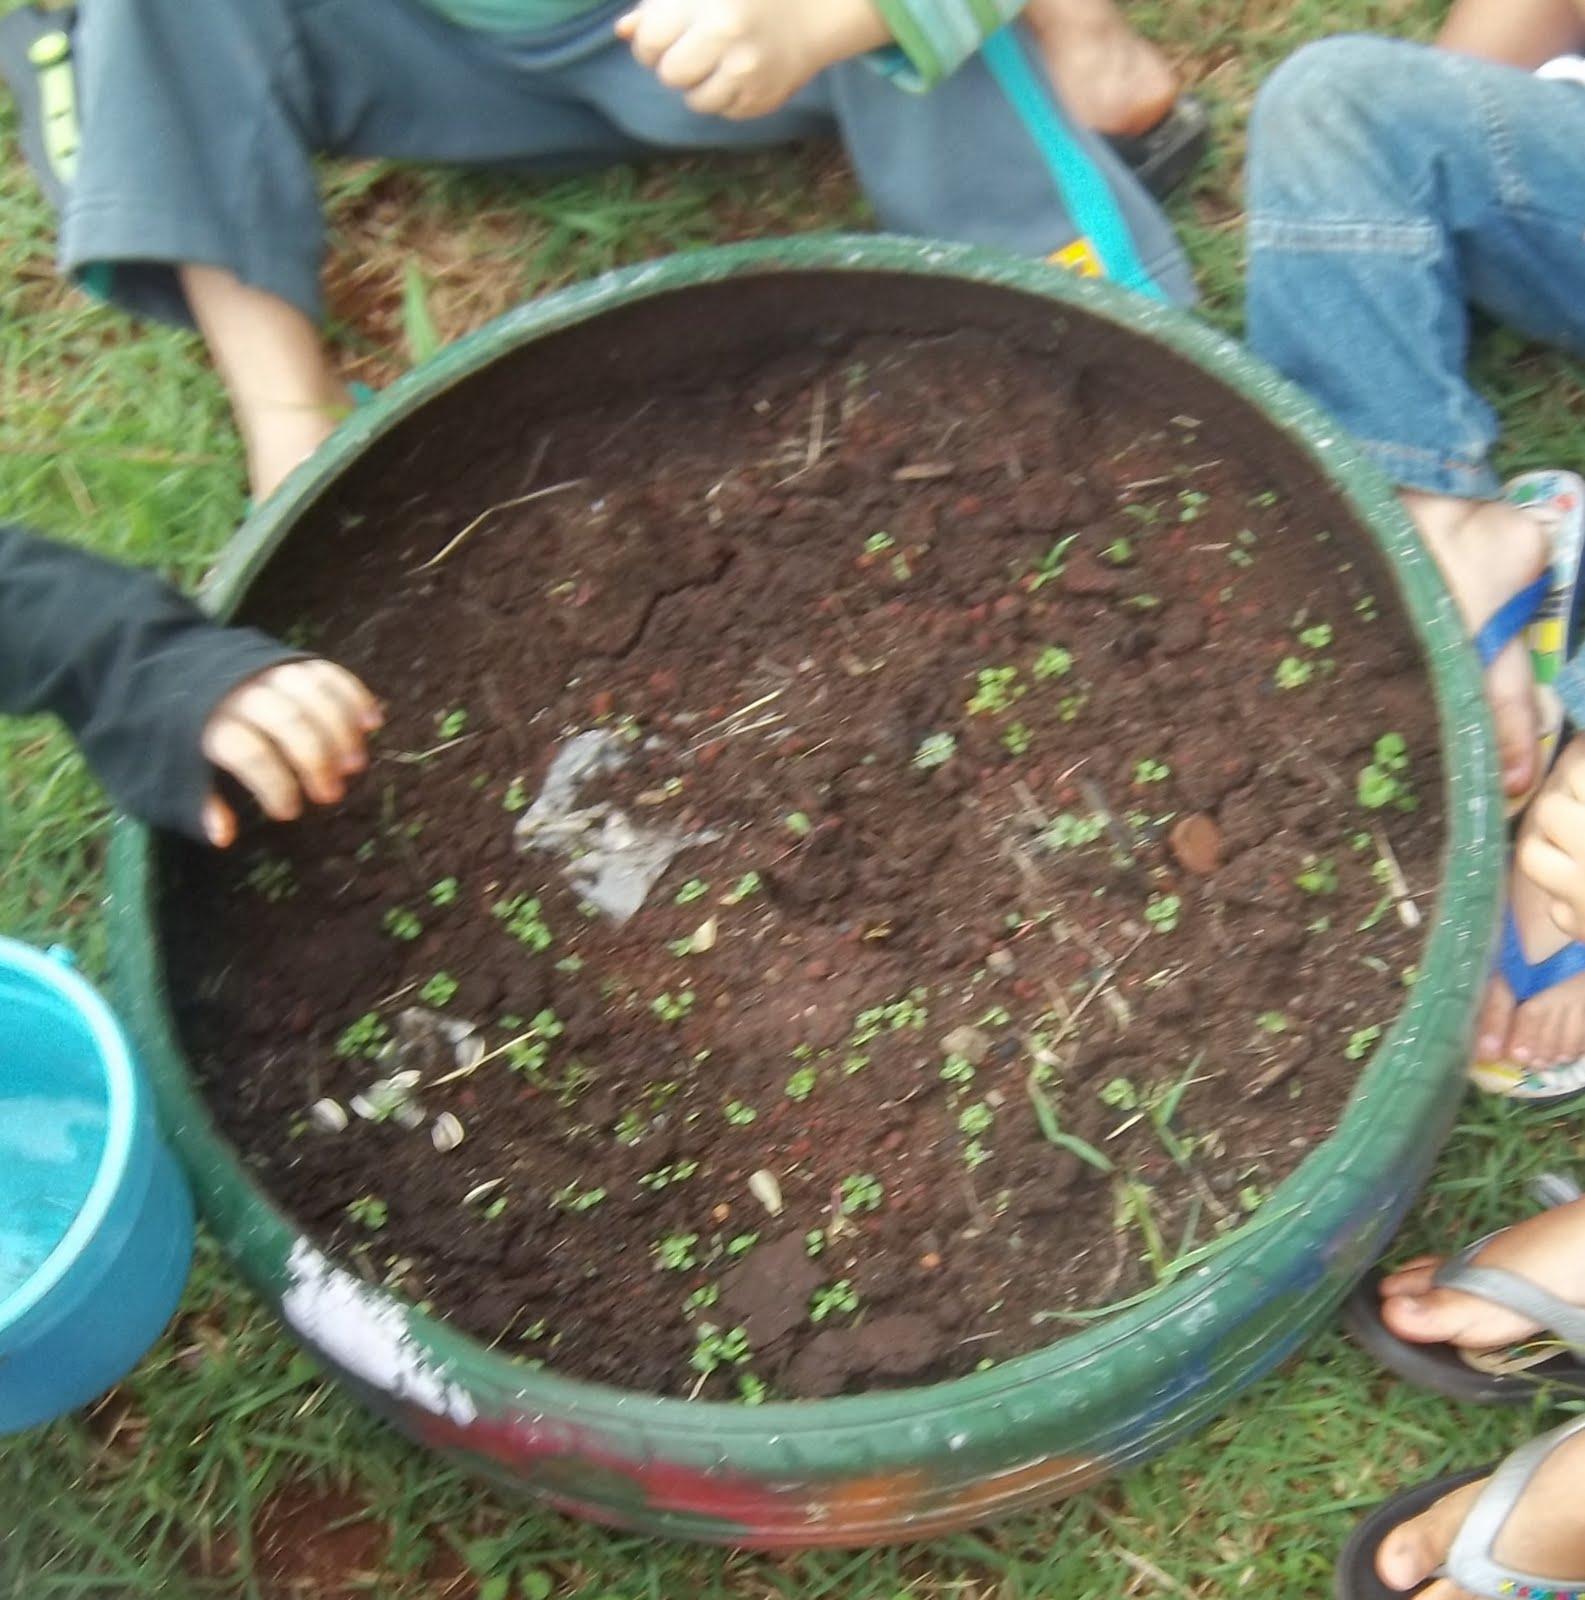 horta e jardim em pneus : horta e jardim em pneus:JARDIM FLORIDO: JARDIM DE PNEU